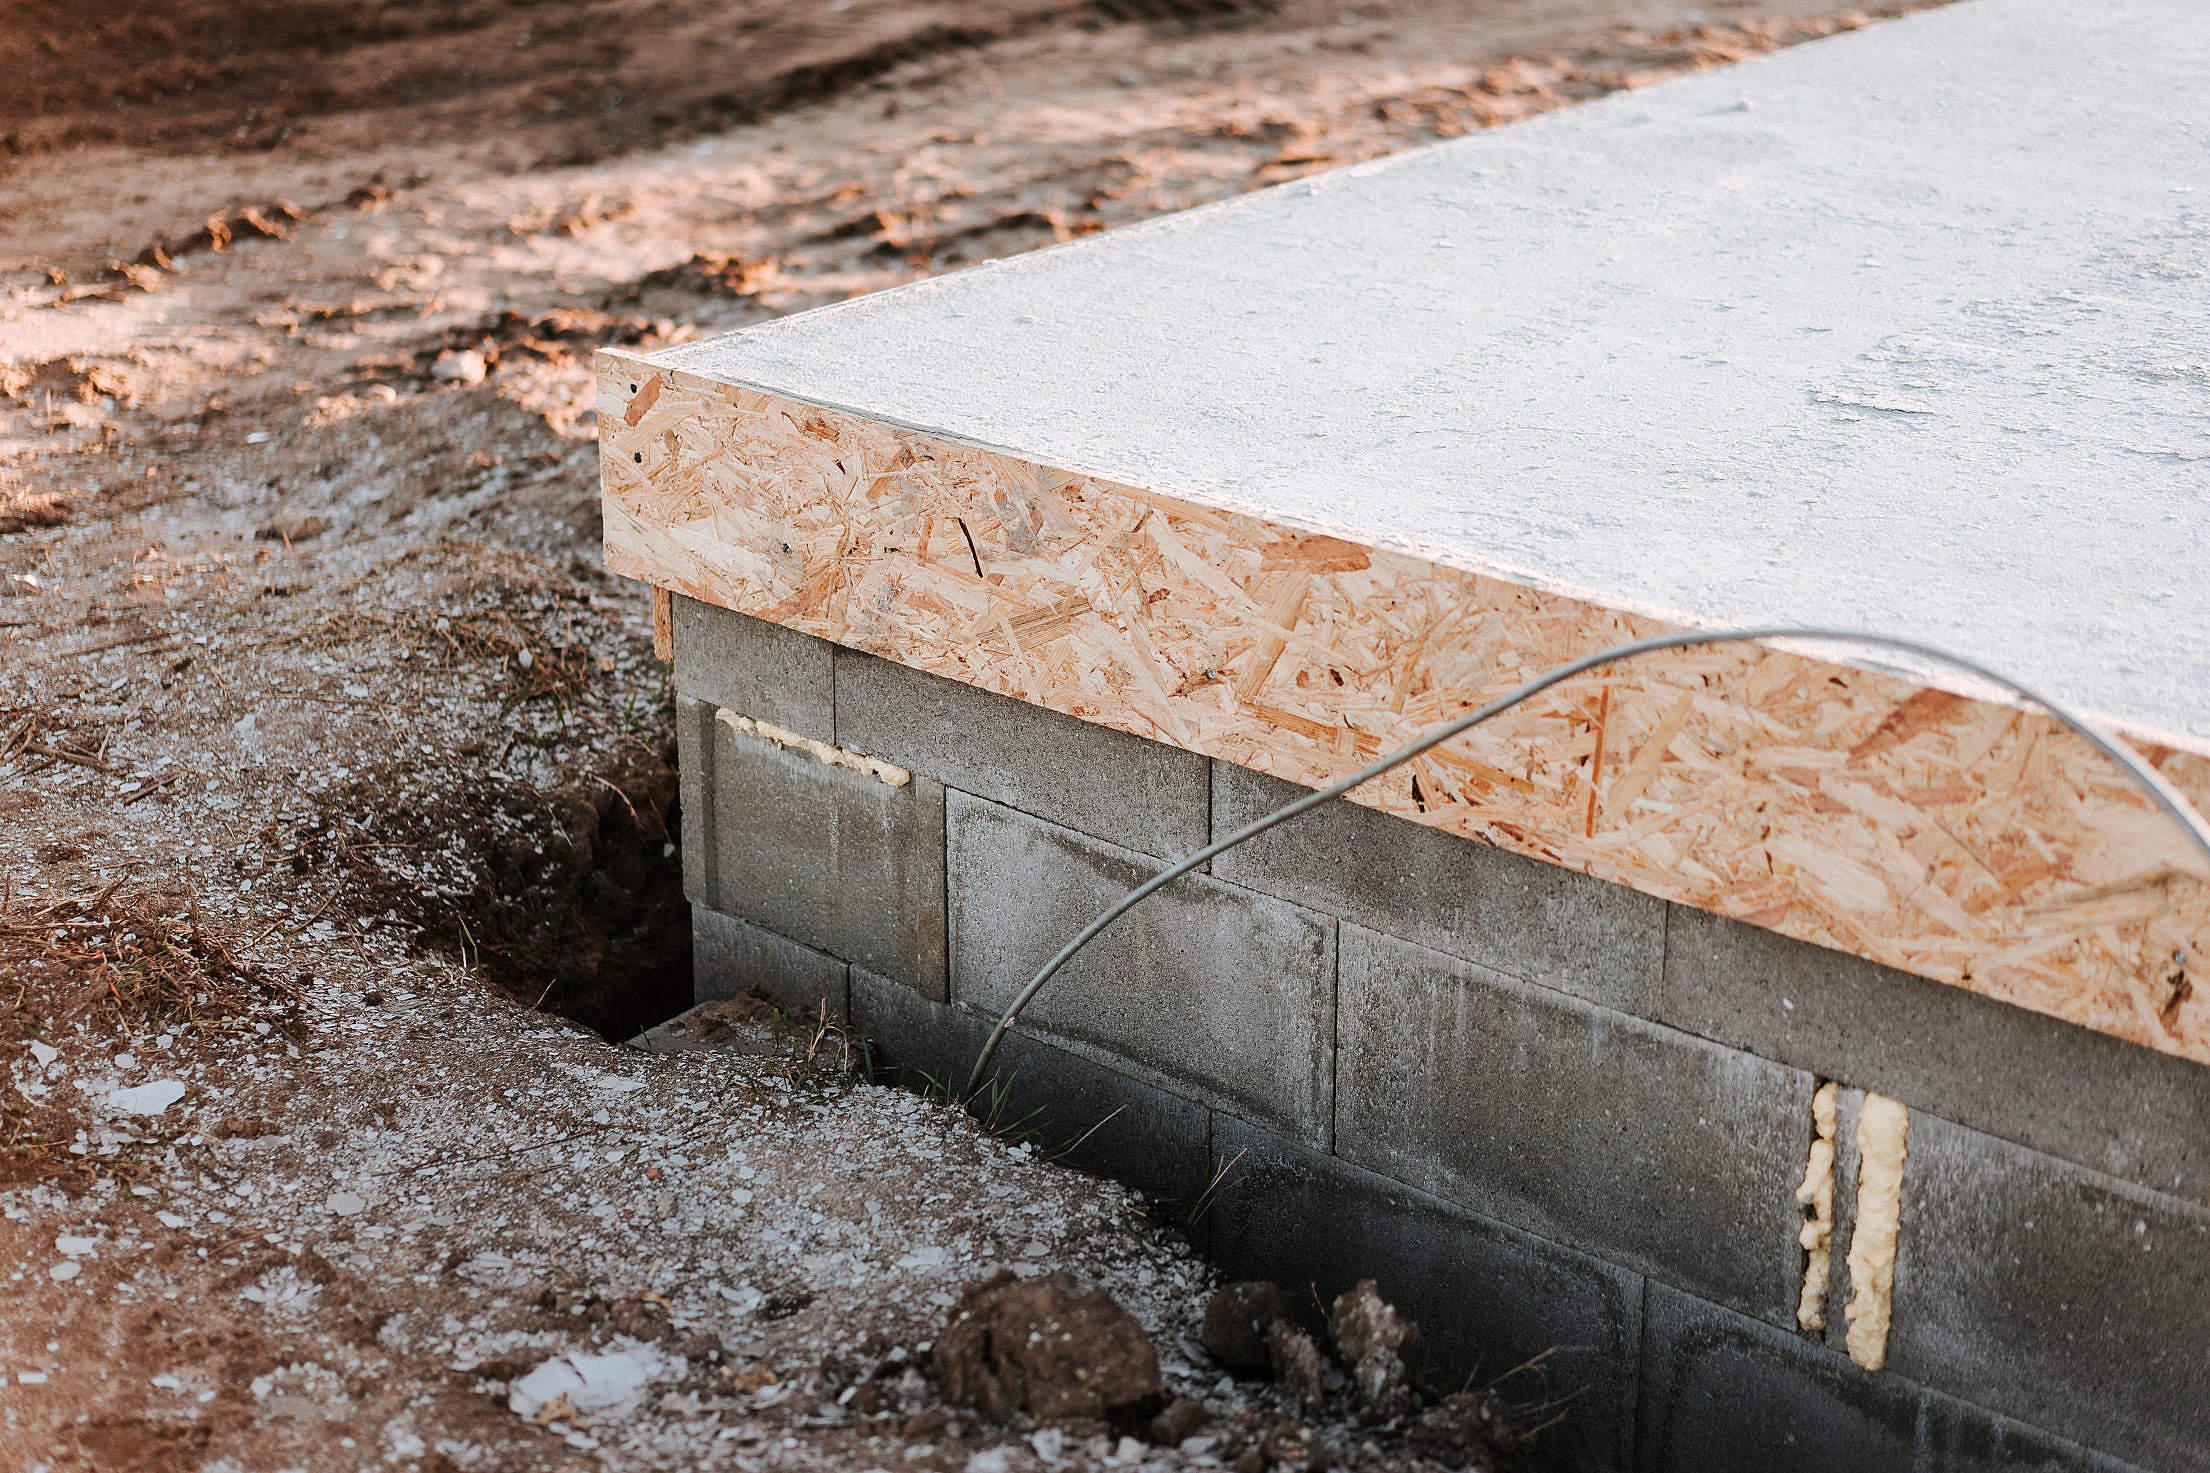 Concrete Slab-On-Grade House Foundations Free Stock Photo